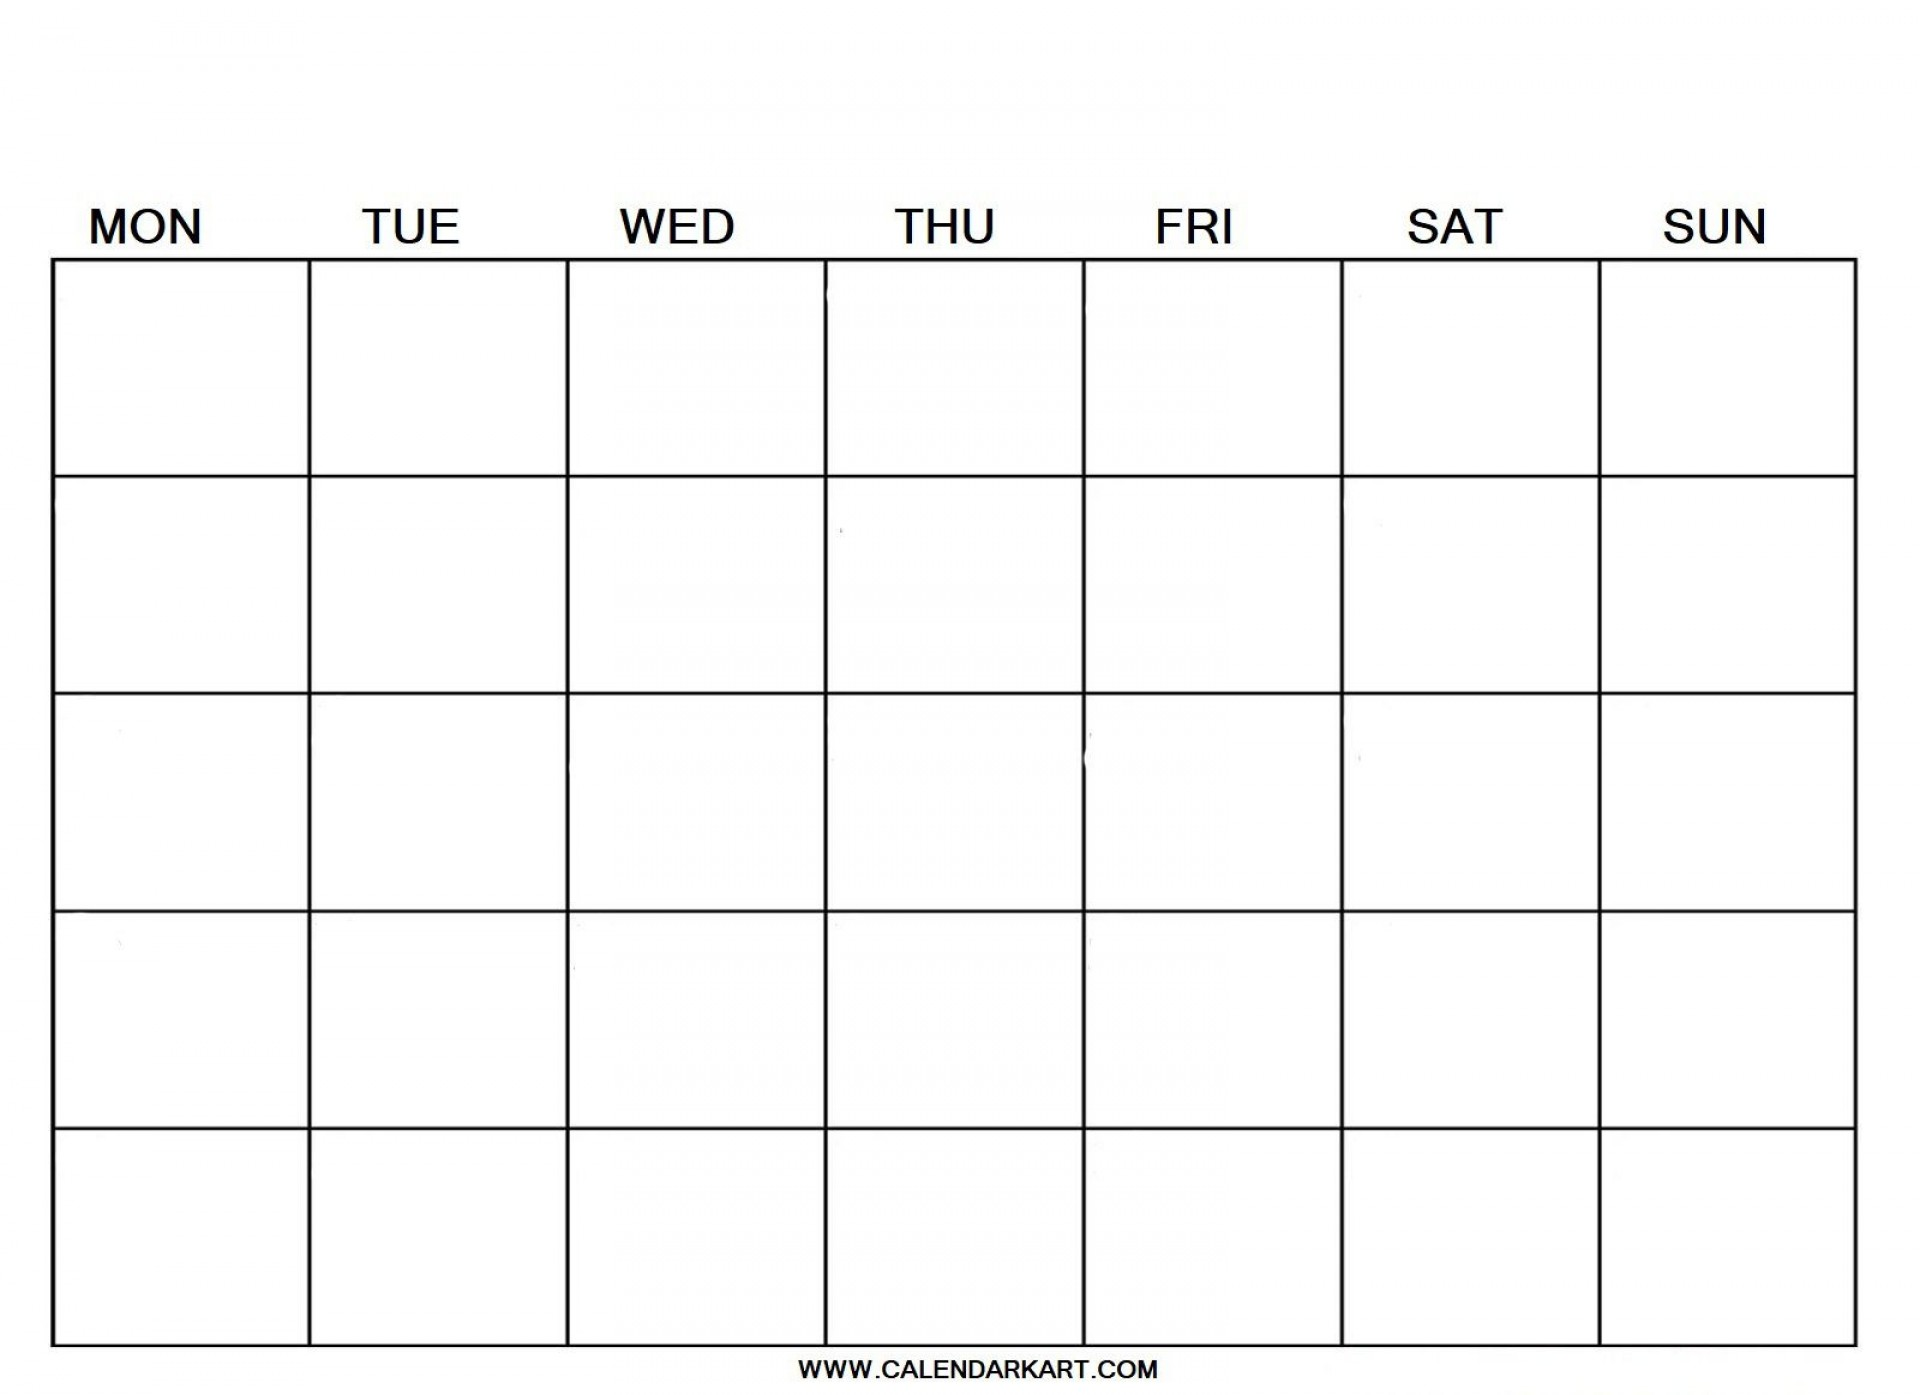 007 Breathtaking Blank Calendar Template Pdf Idea  Free Yearly1920